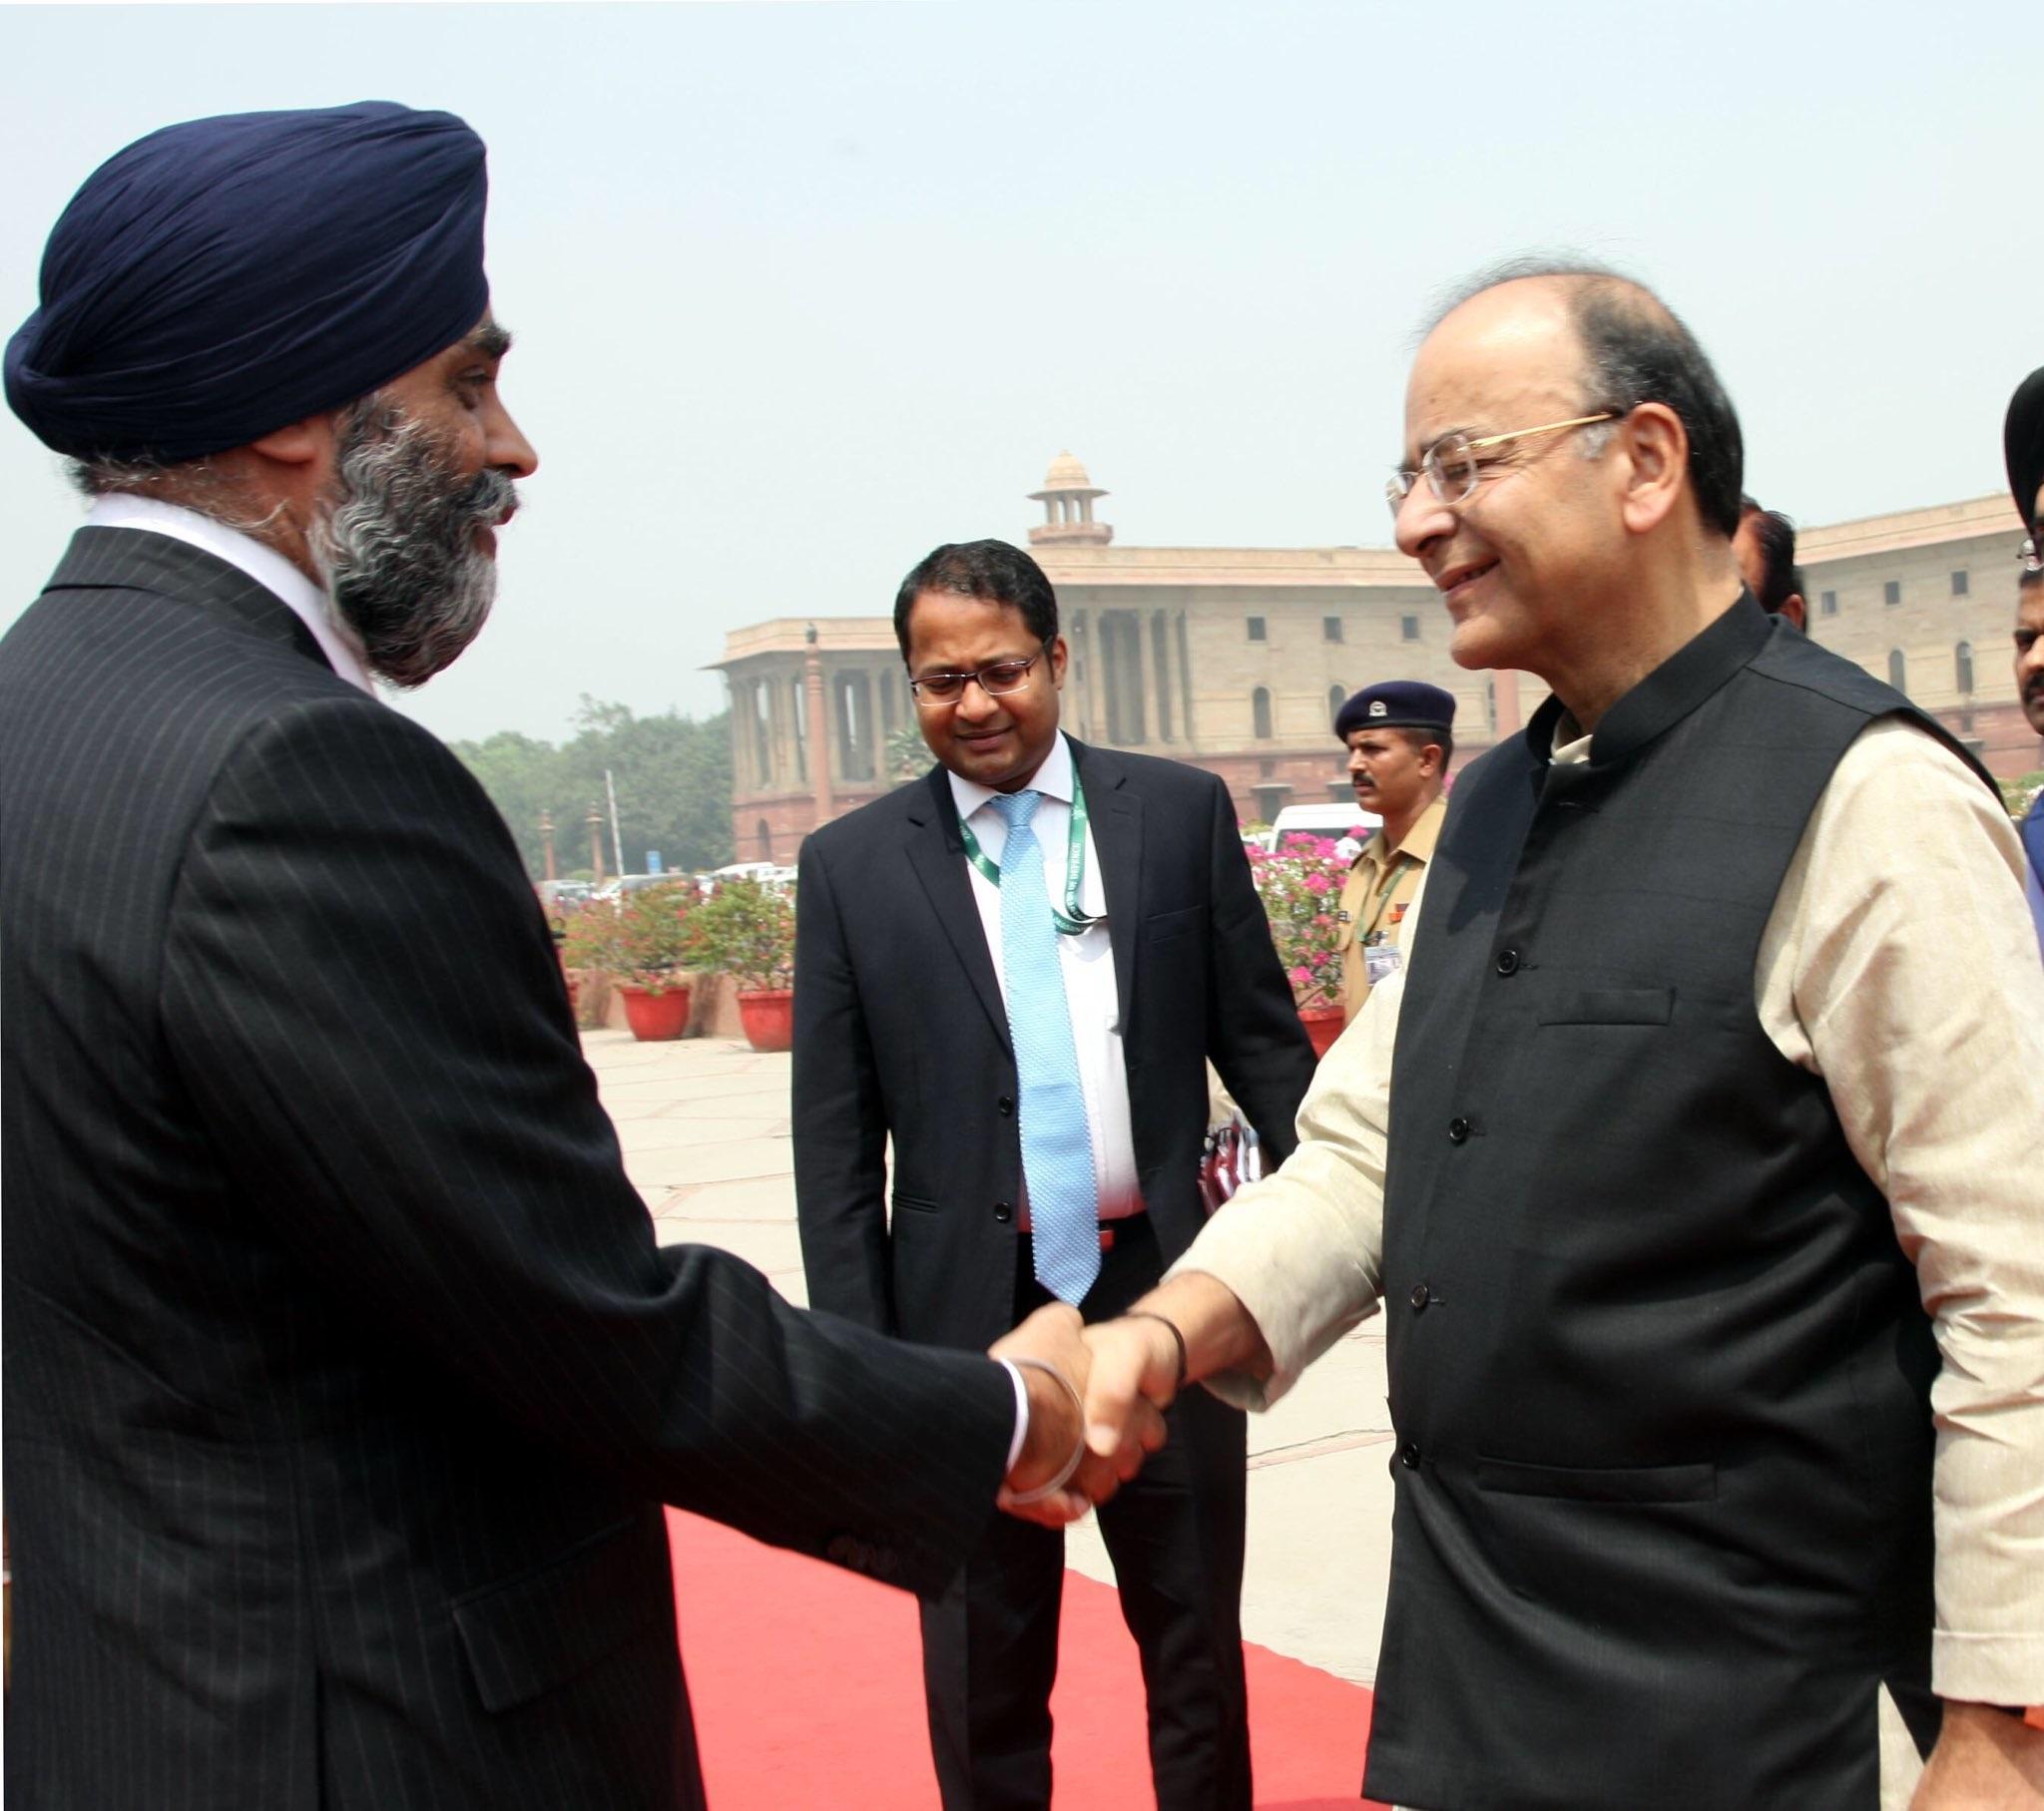 Harjit Singh Sajjan (left) meeting Arun Jaitley in New Delhi.